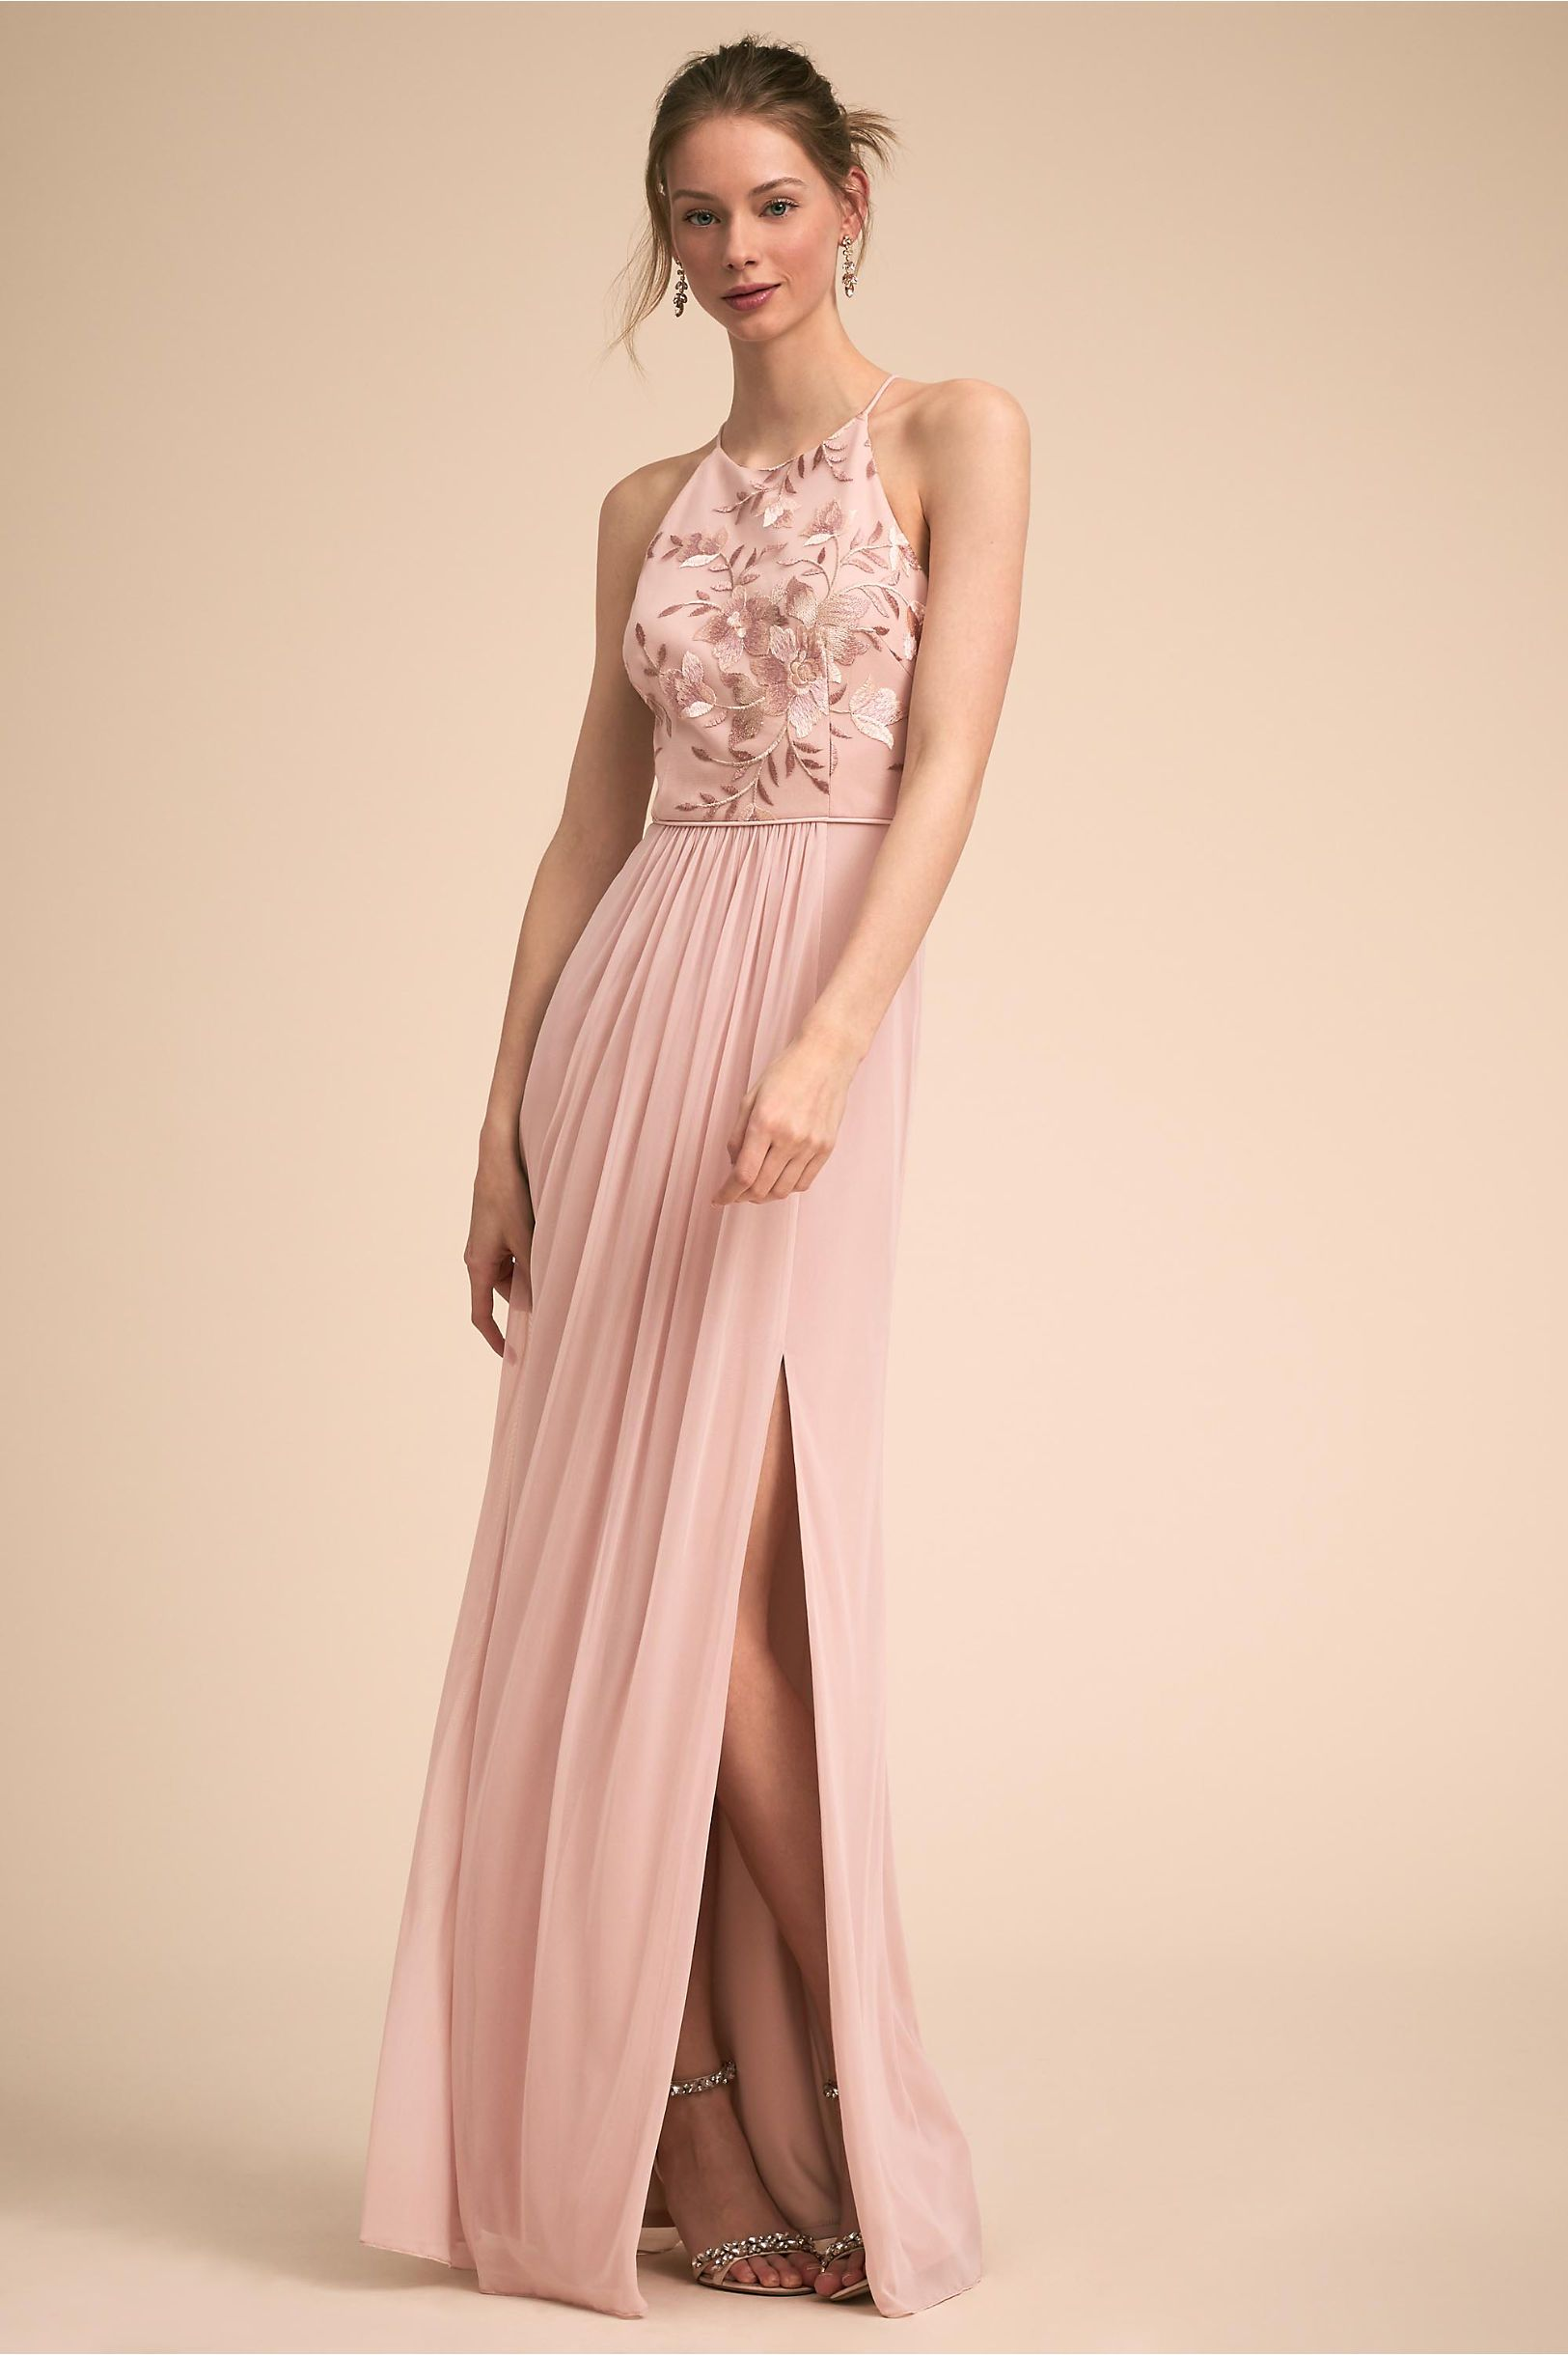 Carine dress rosewood in bridesmaids u bridal party bhldn dream